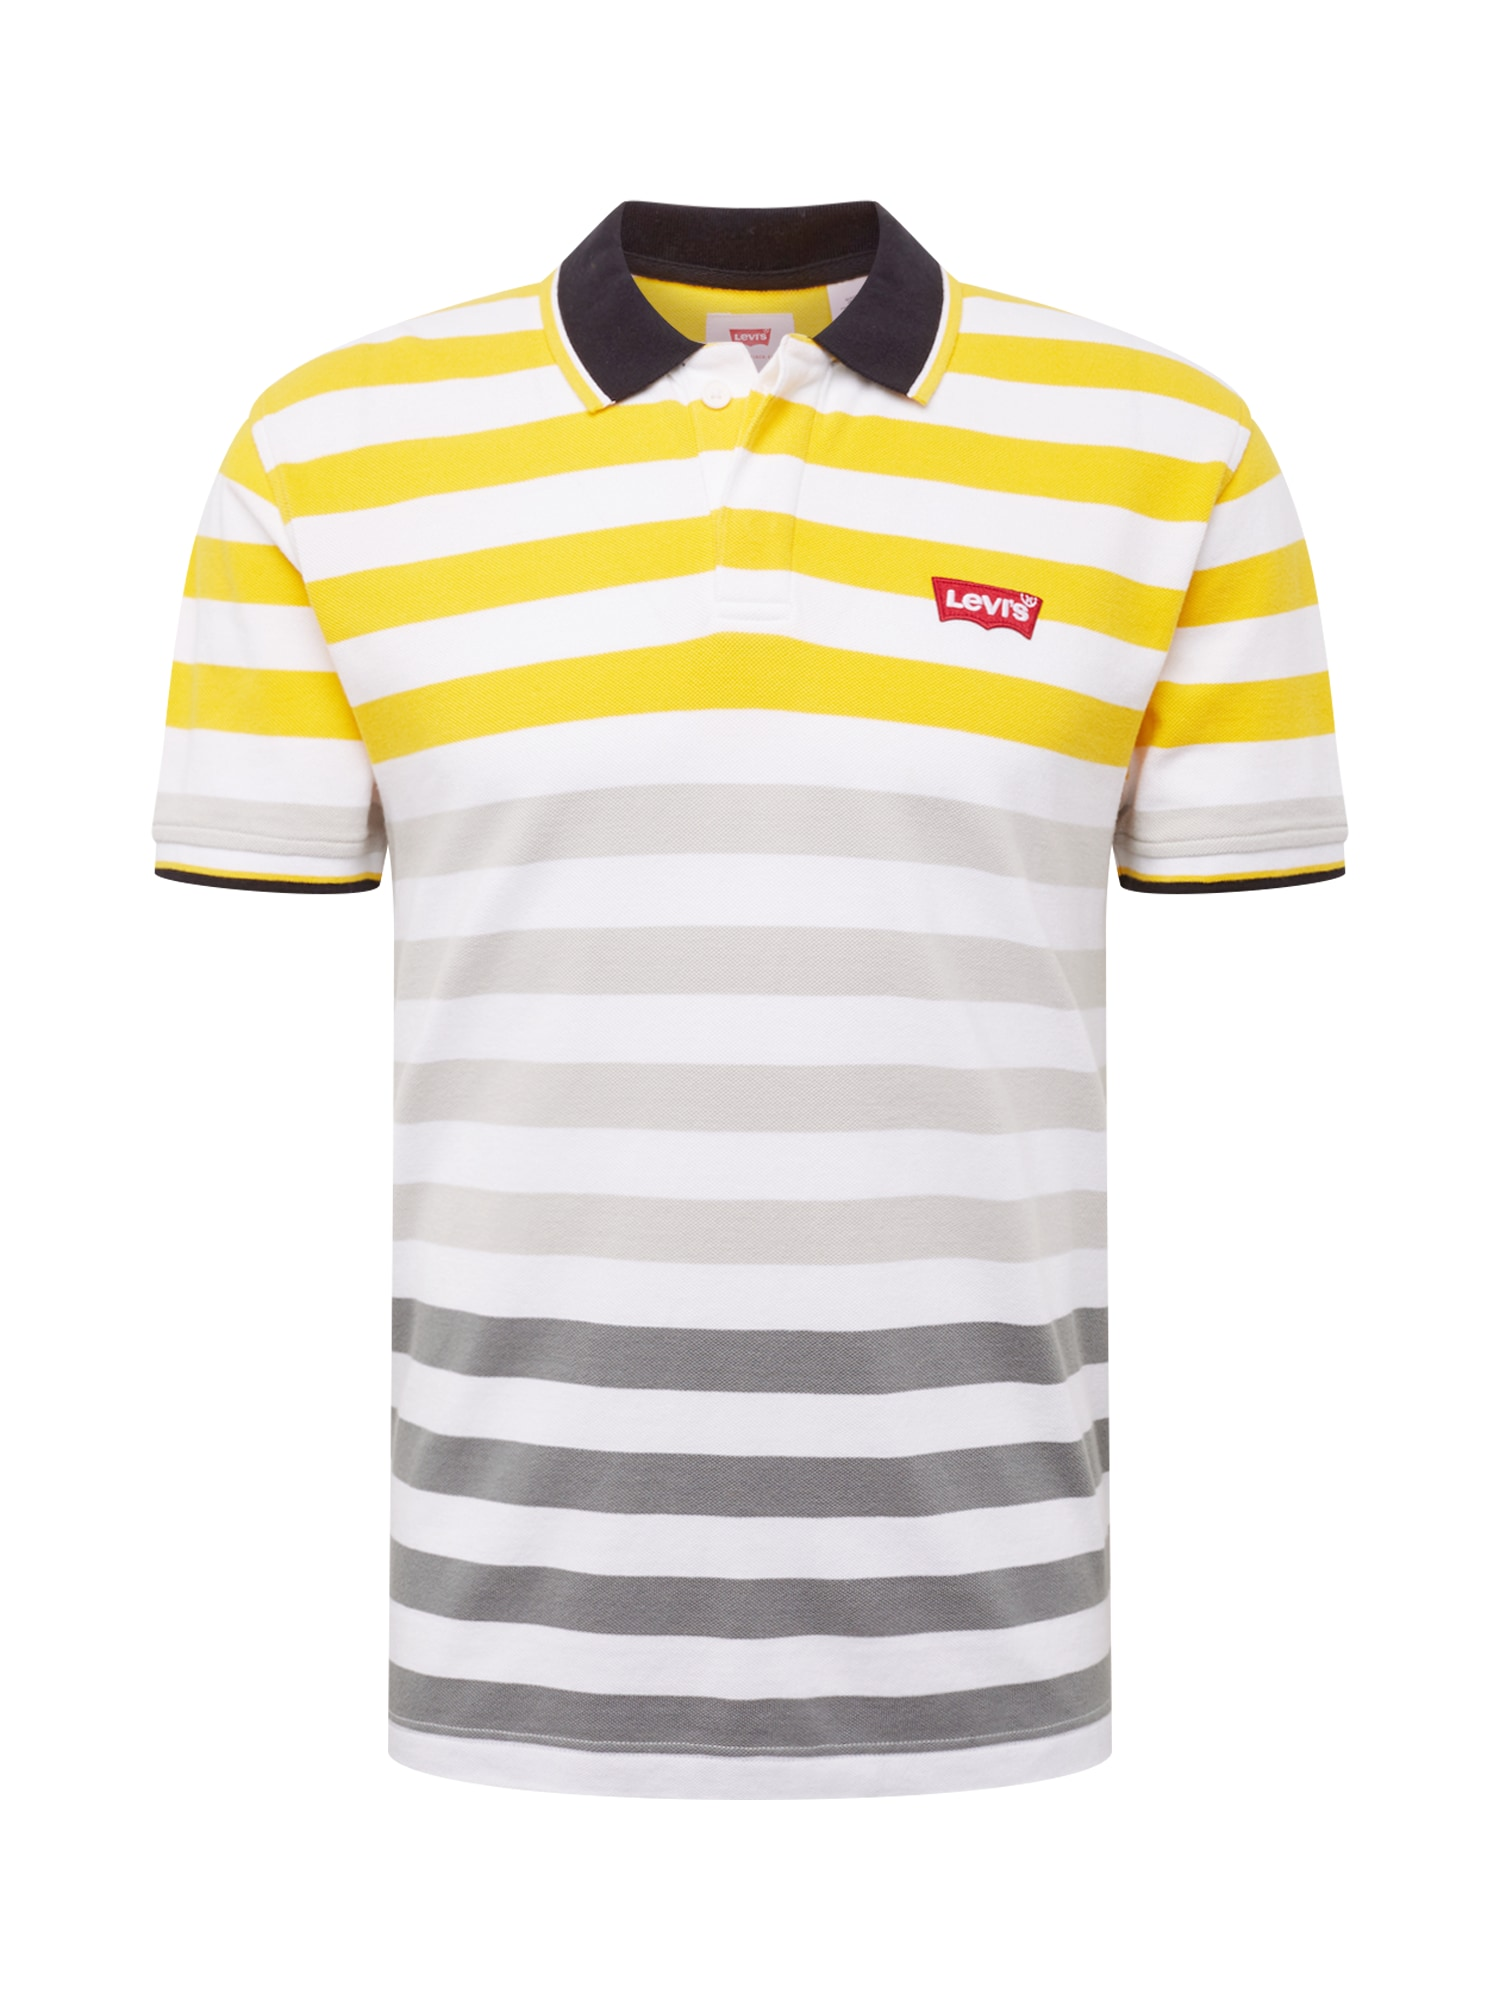 LEVIS Tričko žlutá šedá černá bílá LEVI'S